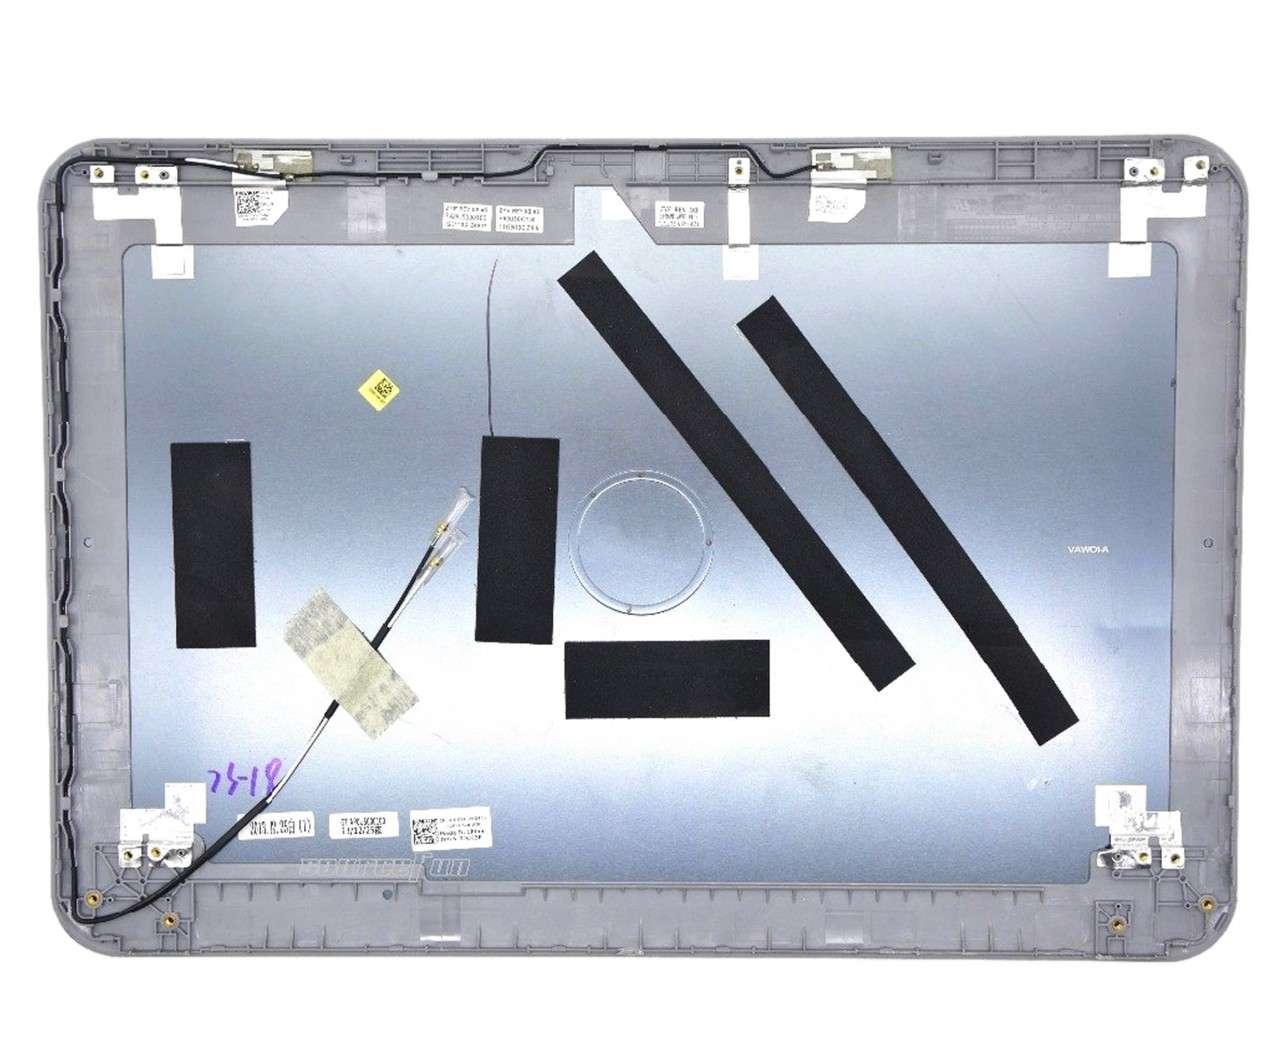 Capac Display BackCover Dell Inspiron 5535 Carcasa Display Gri Metalic imagine powerlaptop.ro 2021